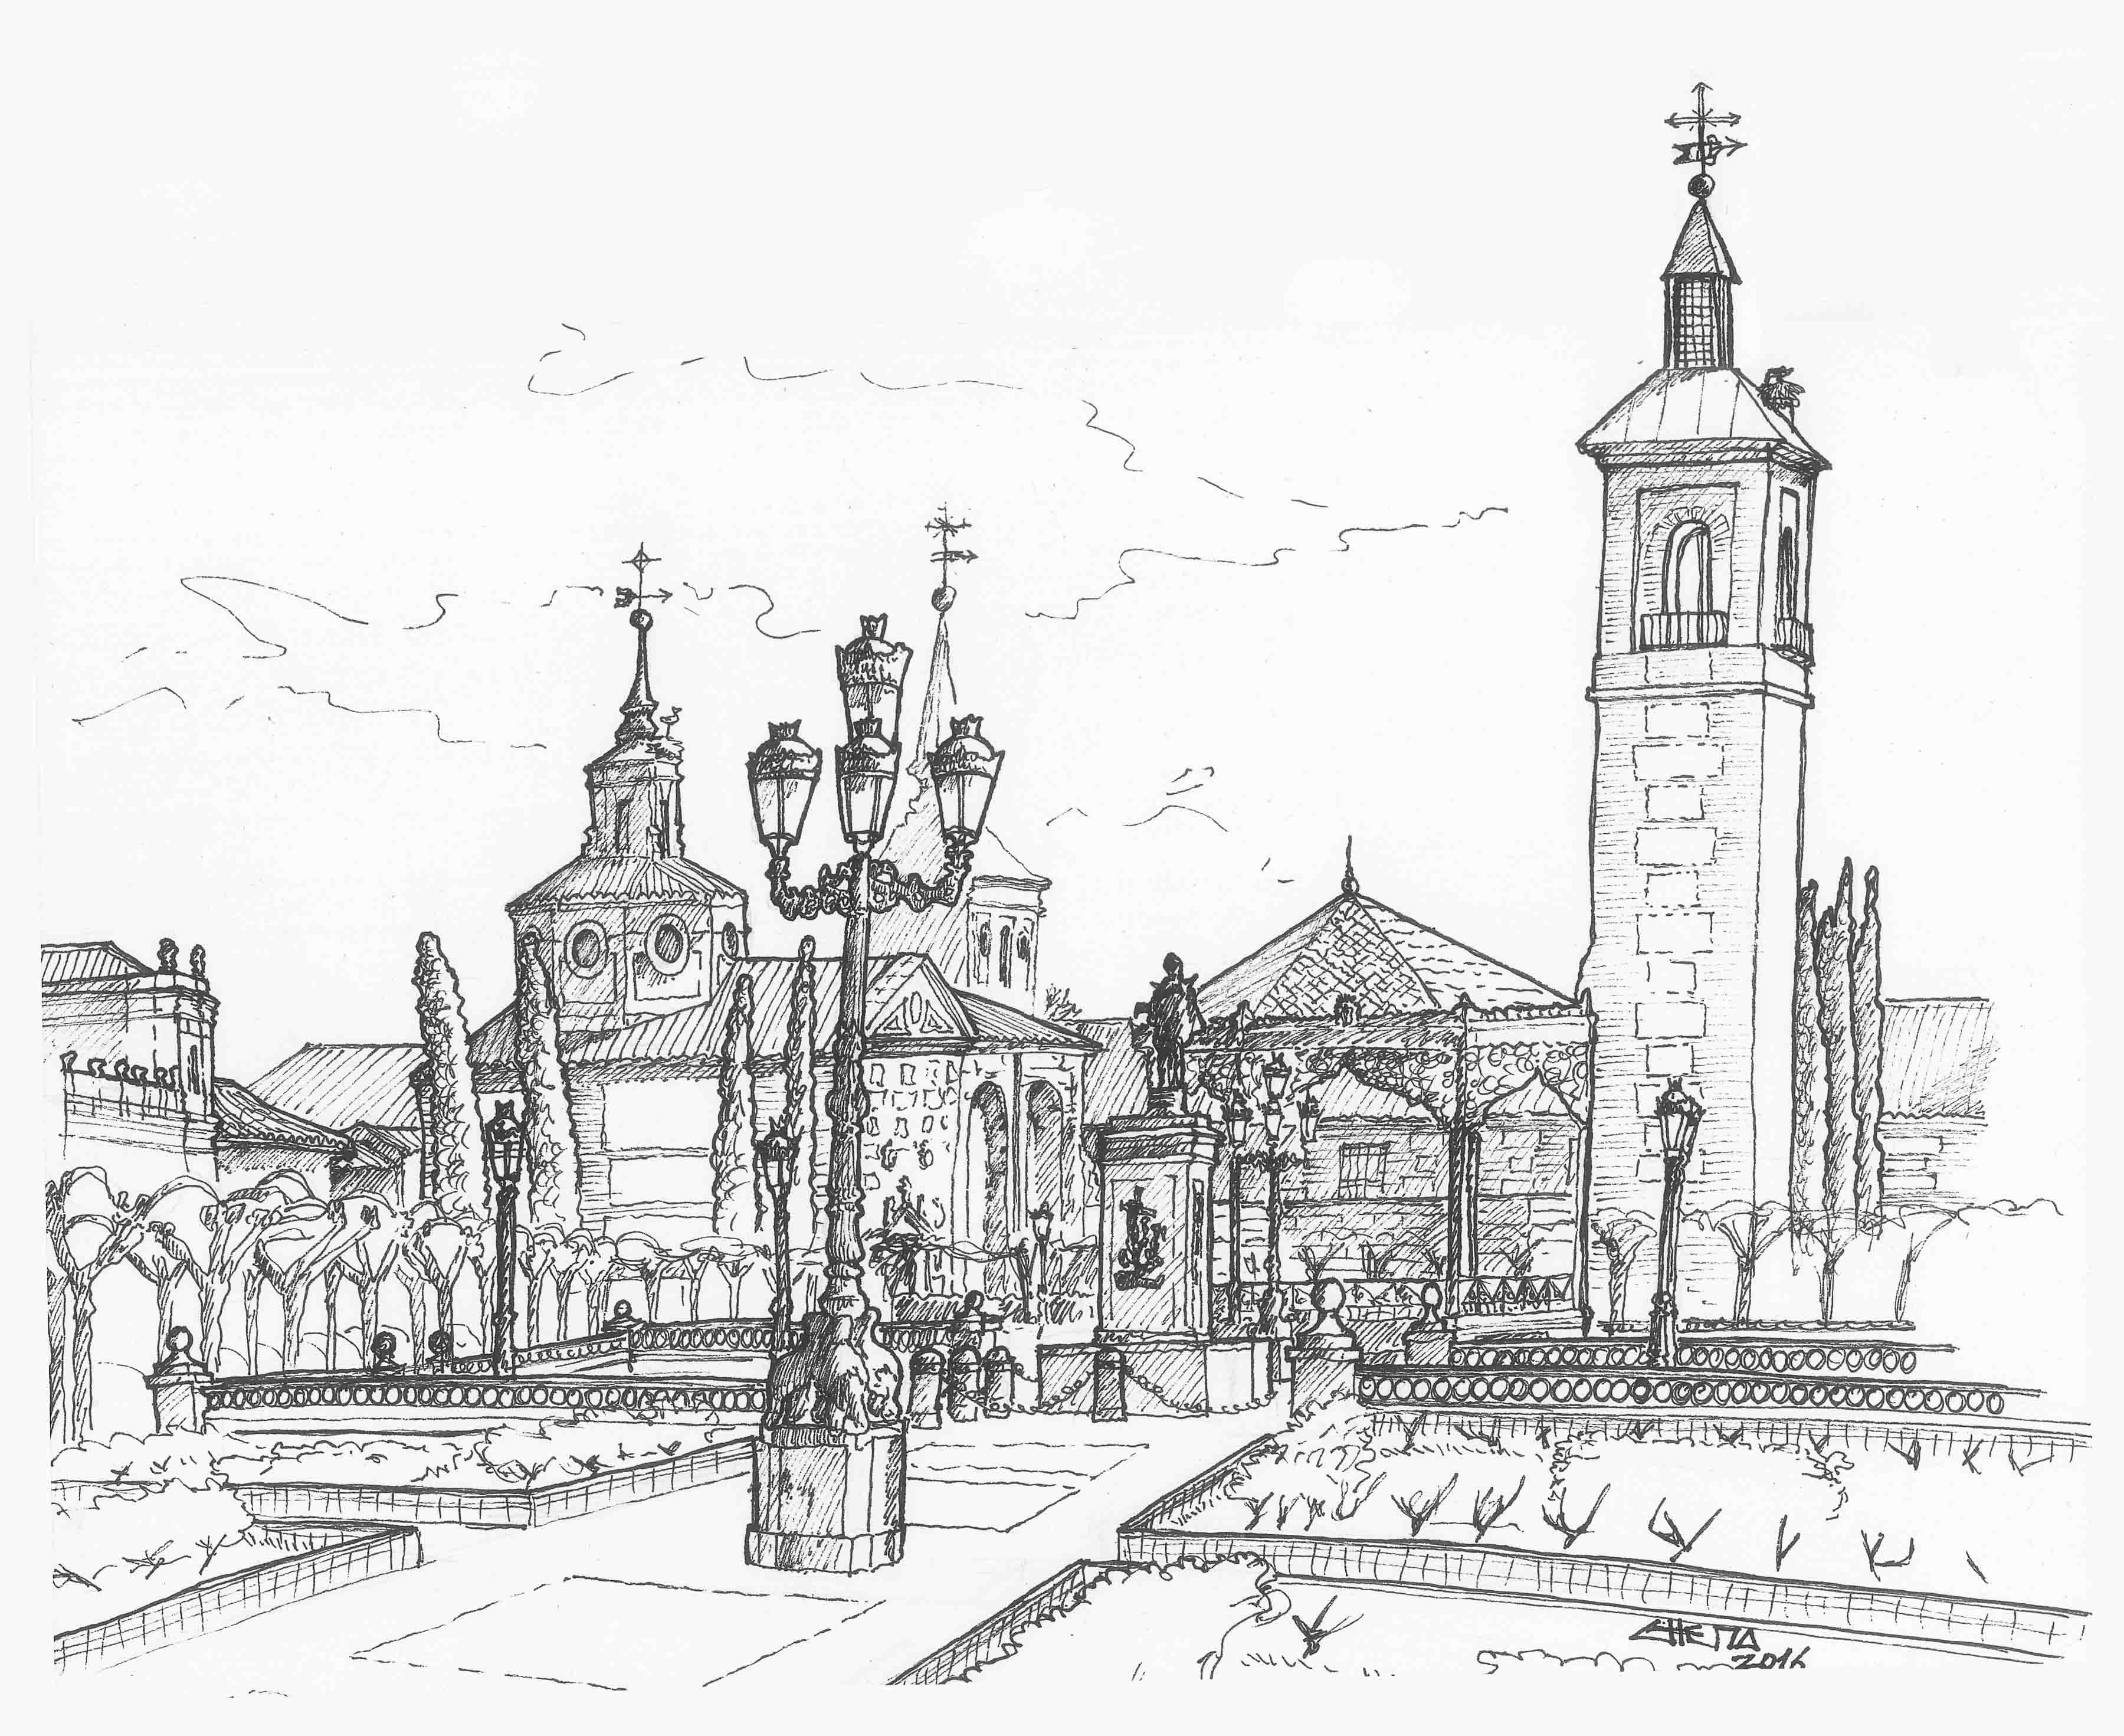 Alcala alcaladehenares illustration drawing sketch ilustracion dibujo boceto marker Arquitectura alcala de henares